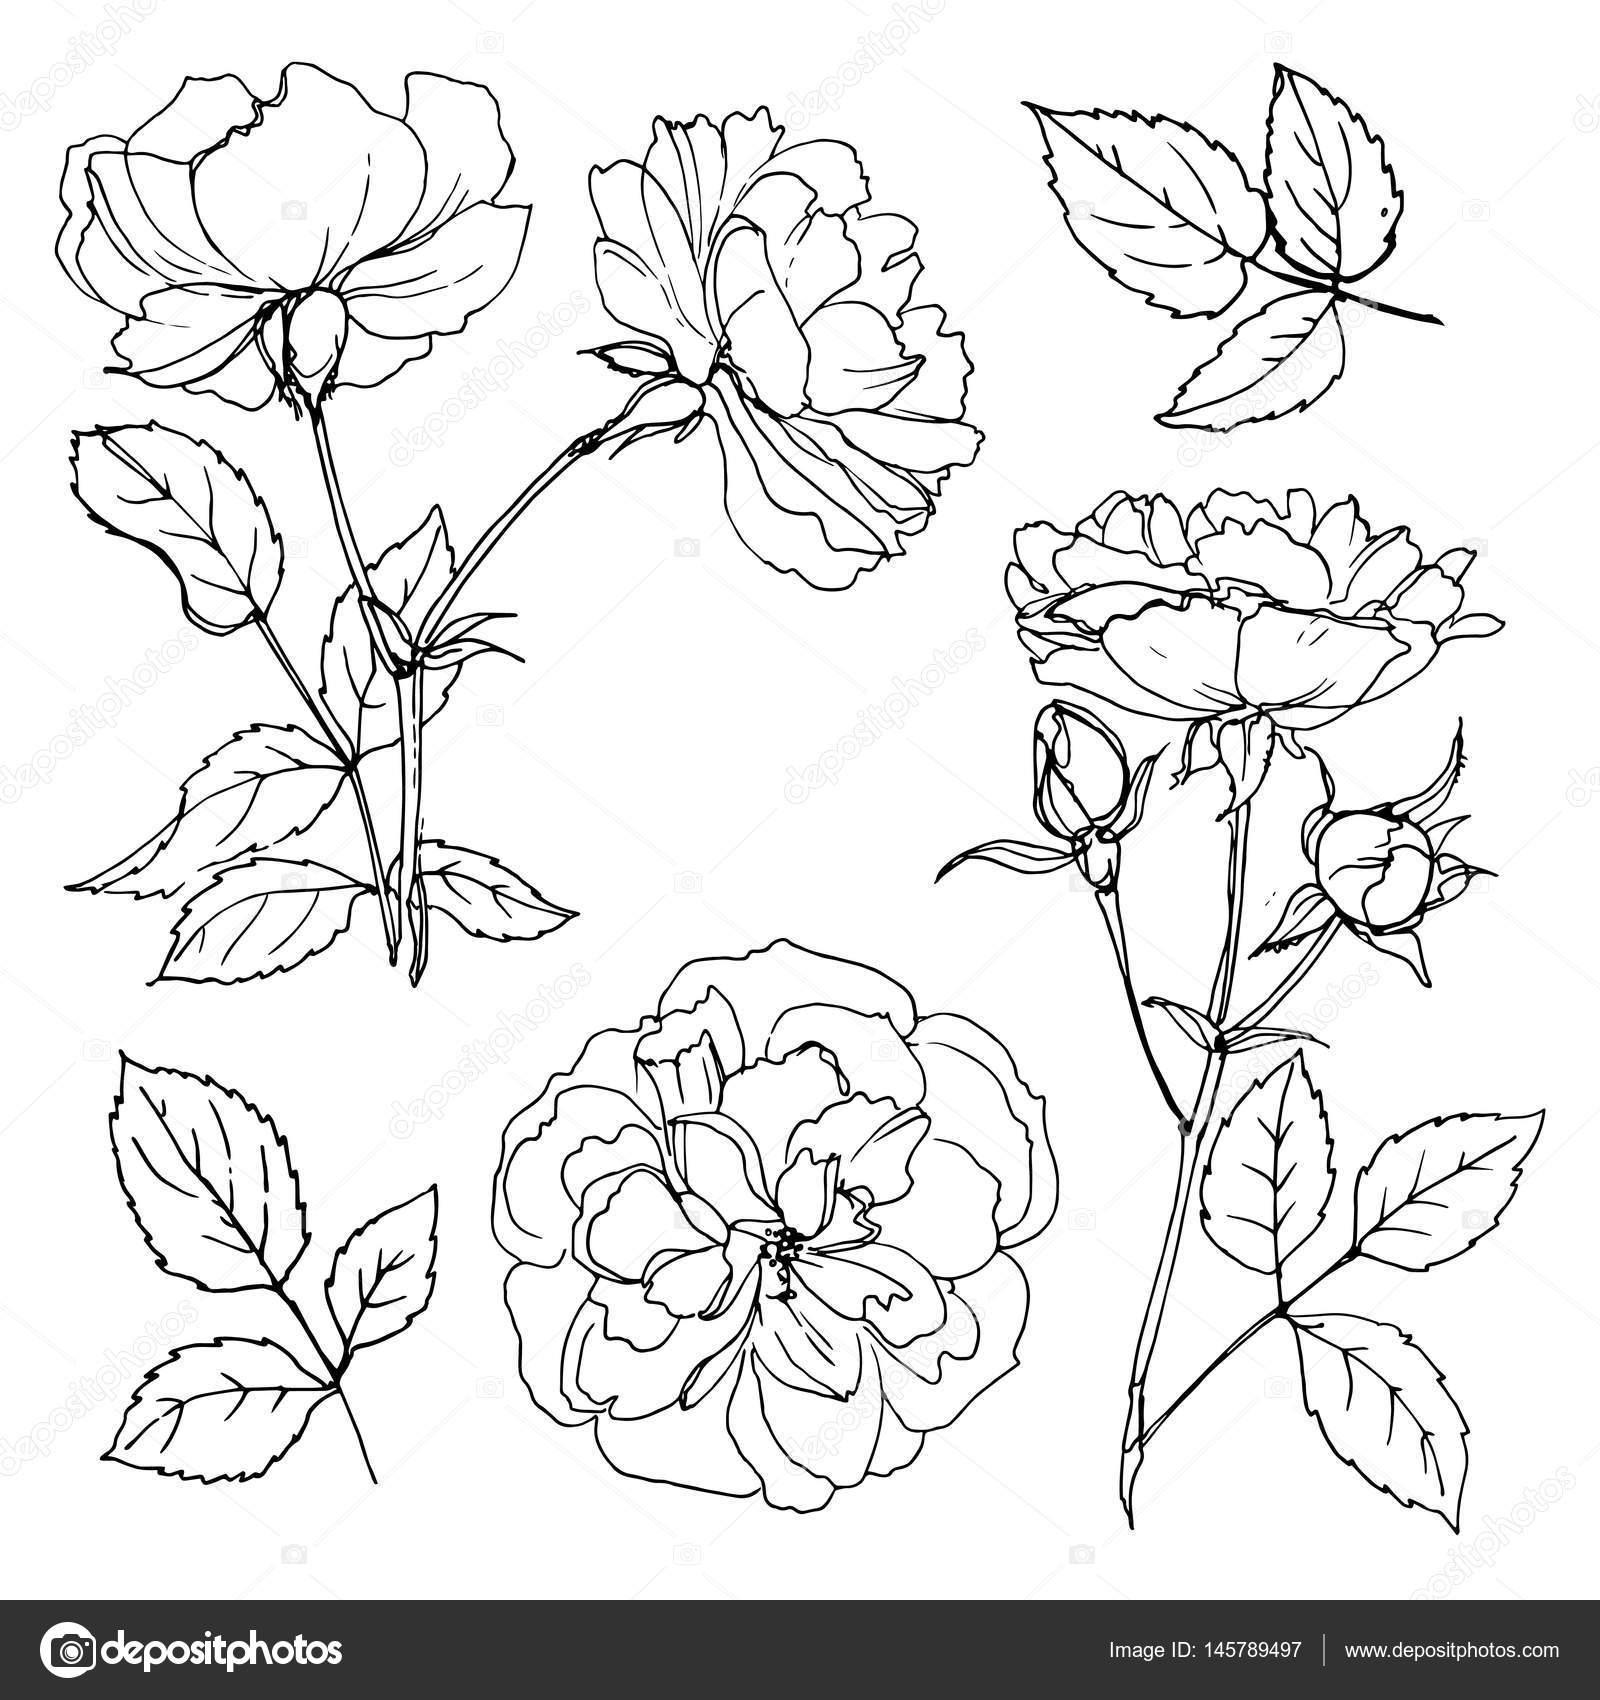 Bei fiori disegnati a mano vettoriali stock vaneevais for Fiori disegnati